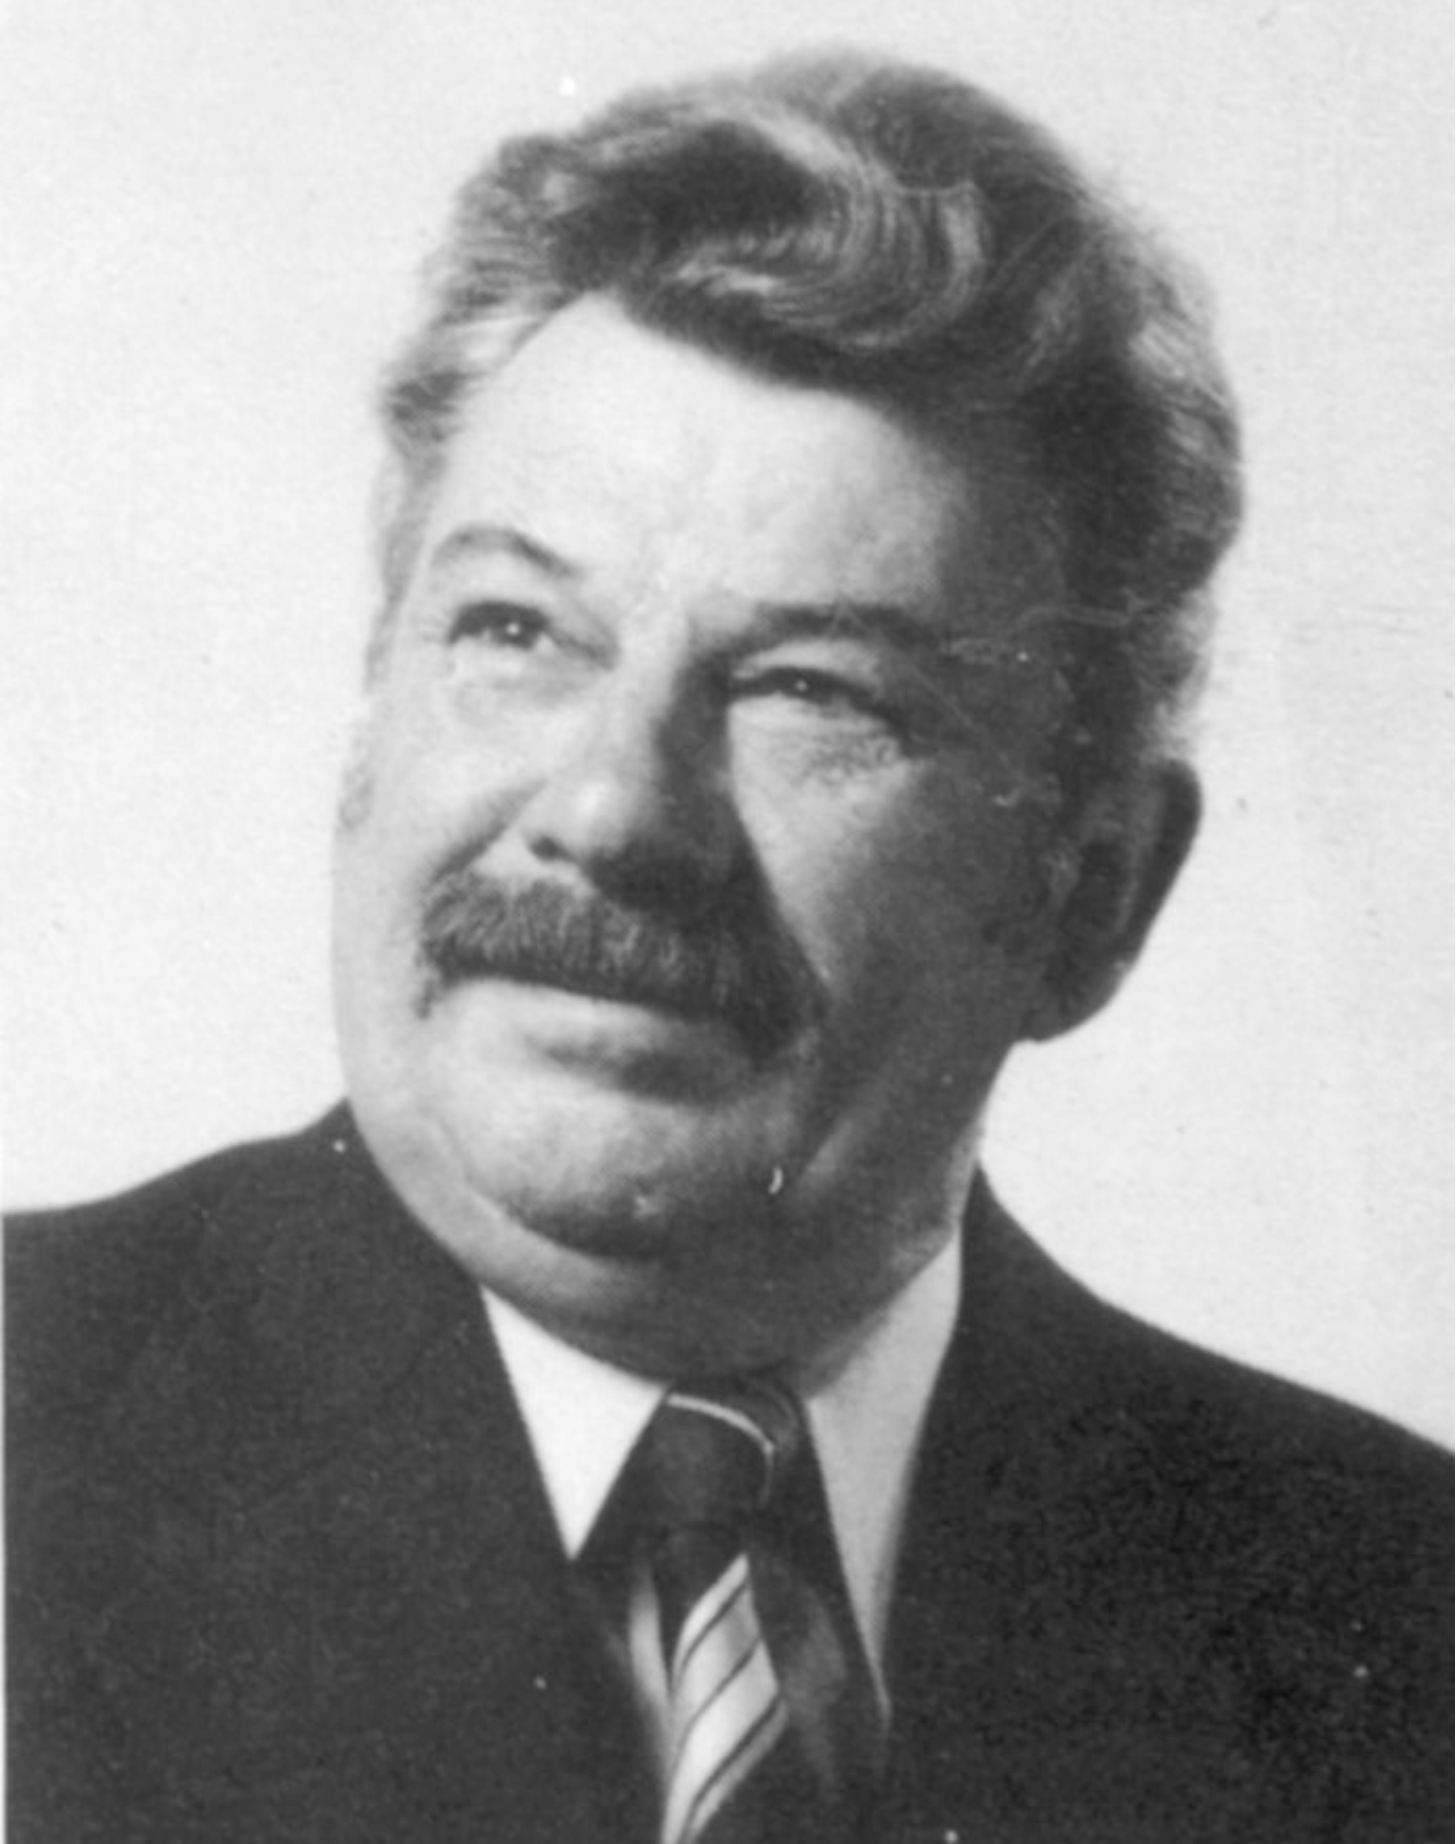 Jean Loncle